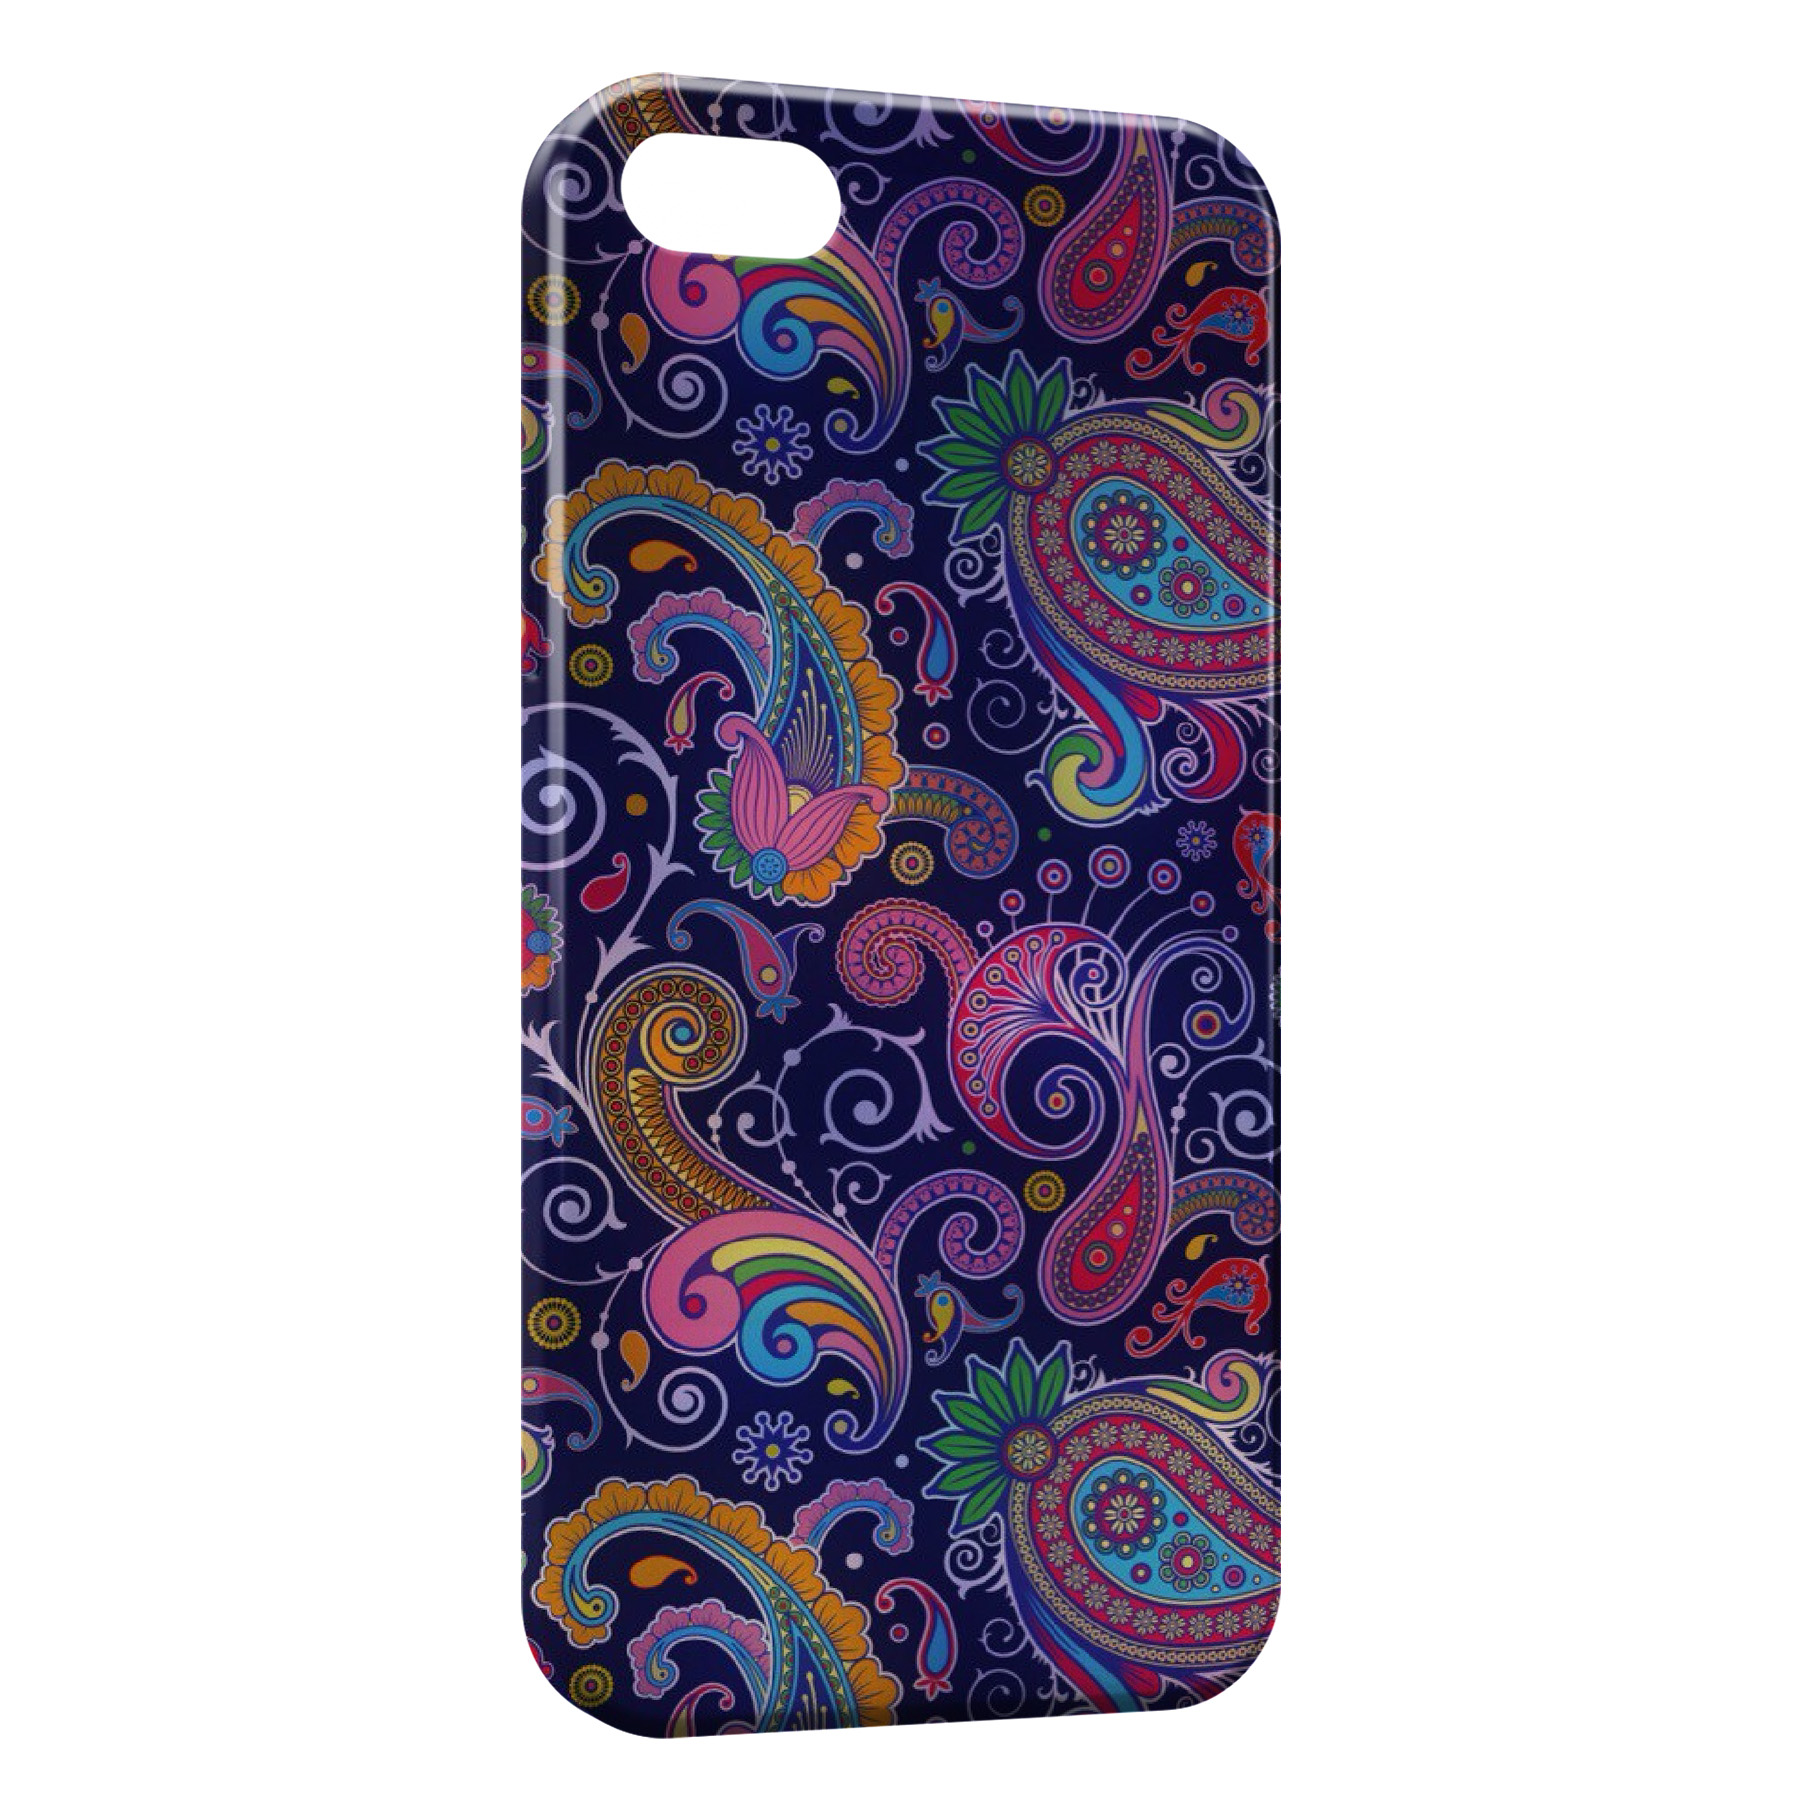 Coque iPhone 5/5S/SE Design Indien Style 6